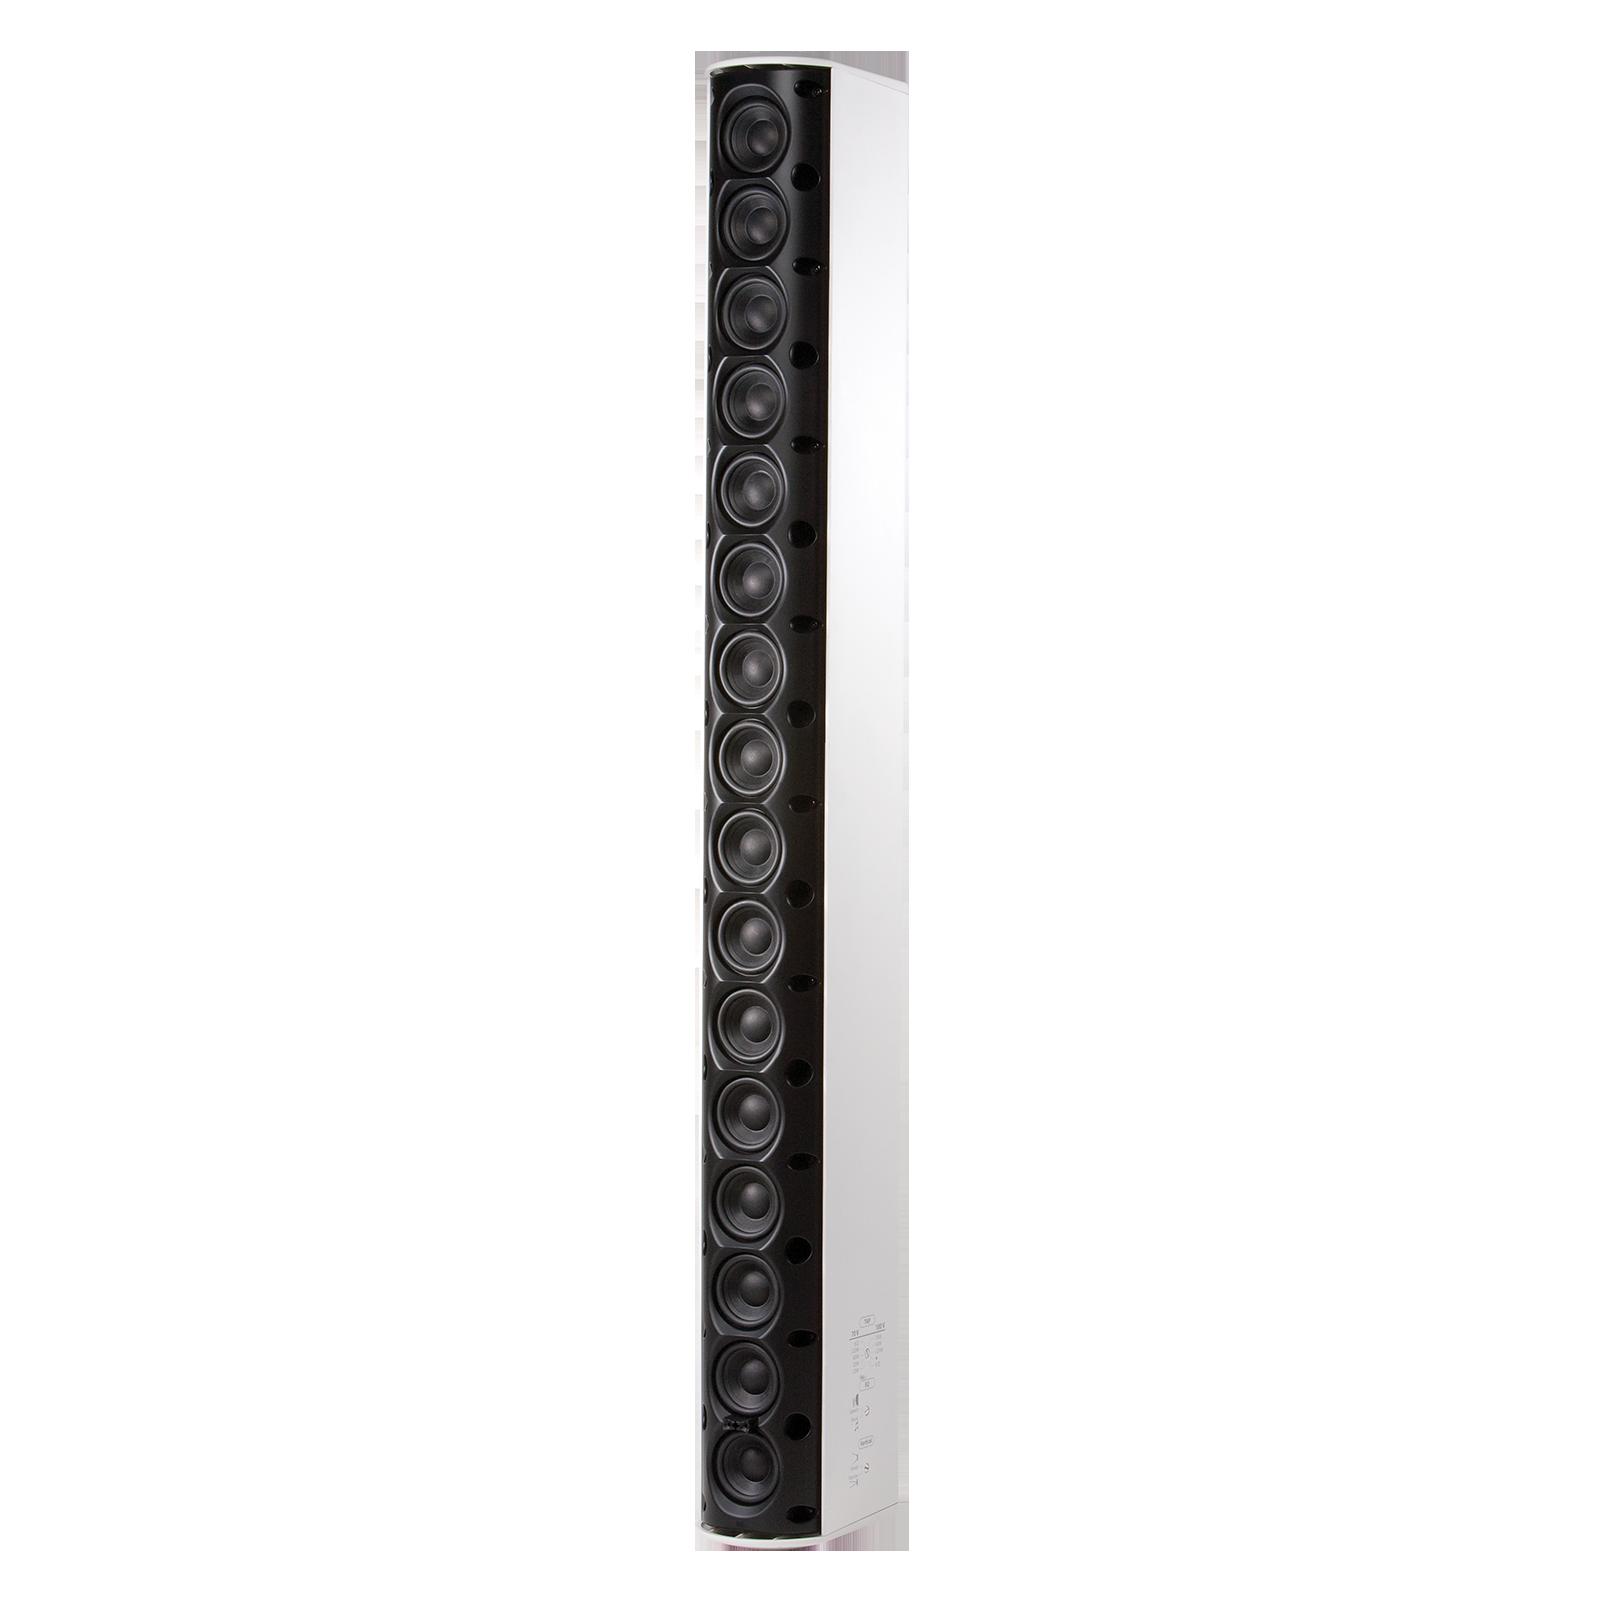 JBL CBT 100LA-1 - White - Constant Beamwidth Technology™ Line Array Column Loudspeaker - Detailshot 1